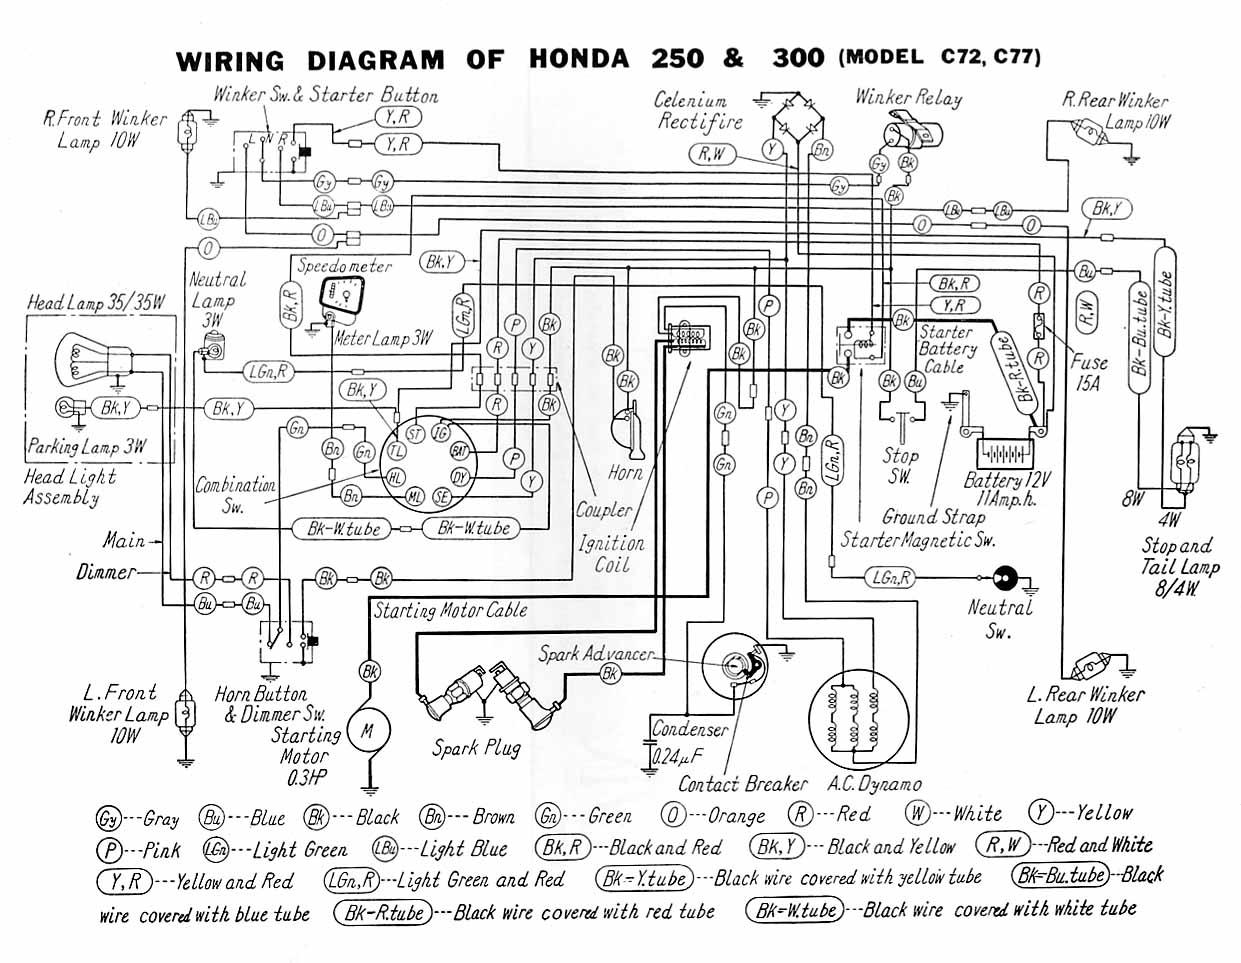 honda 125 motorcycle wiring schematics2009 yf 7457  honda cb92 and ca95 electrical wiring diagram schematic  honda cb92 and ca95 electrical wiring